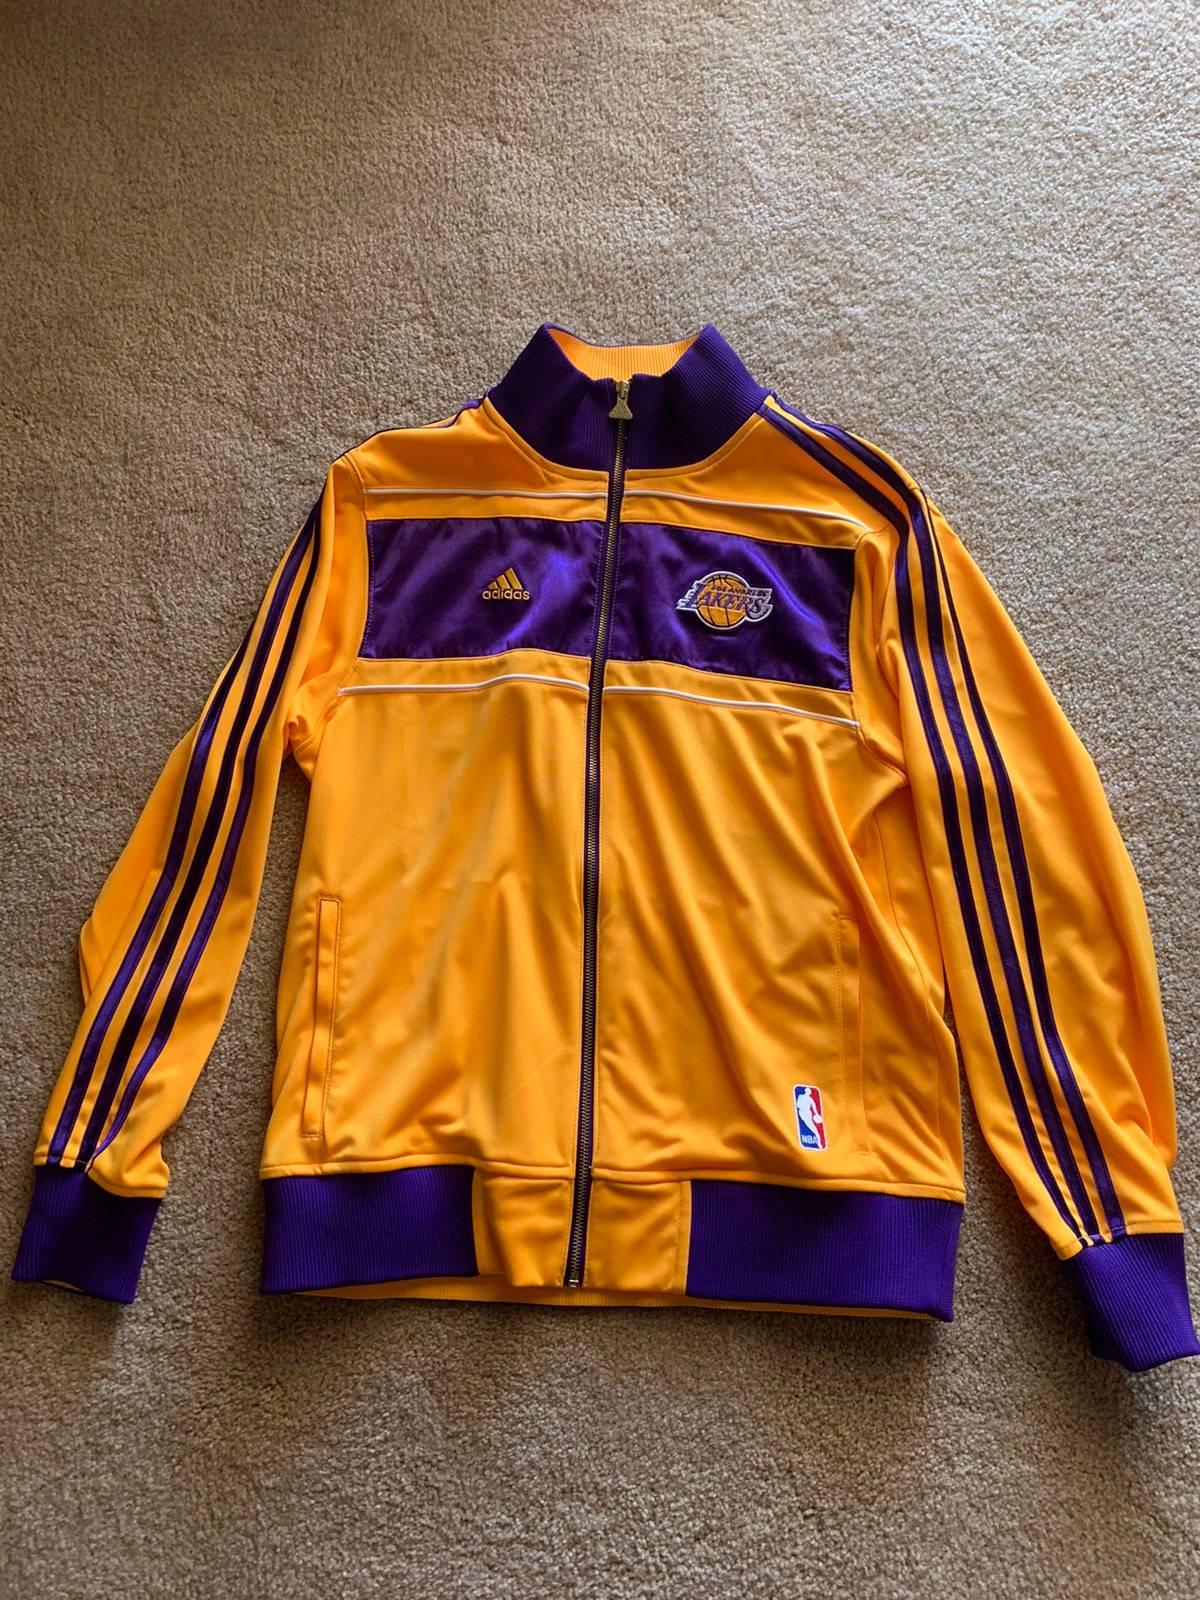 Adidas Los Angeles Lakers Nba Championship Ring Ceremony Jacket Grailed